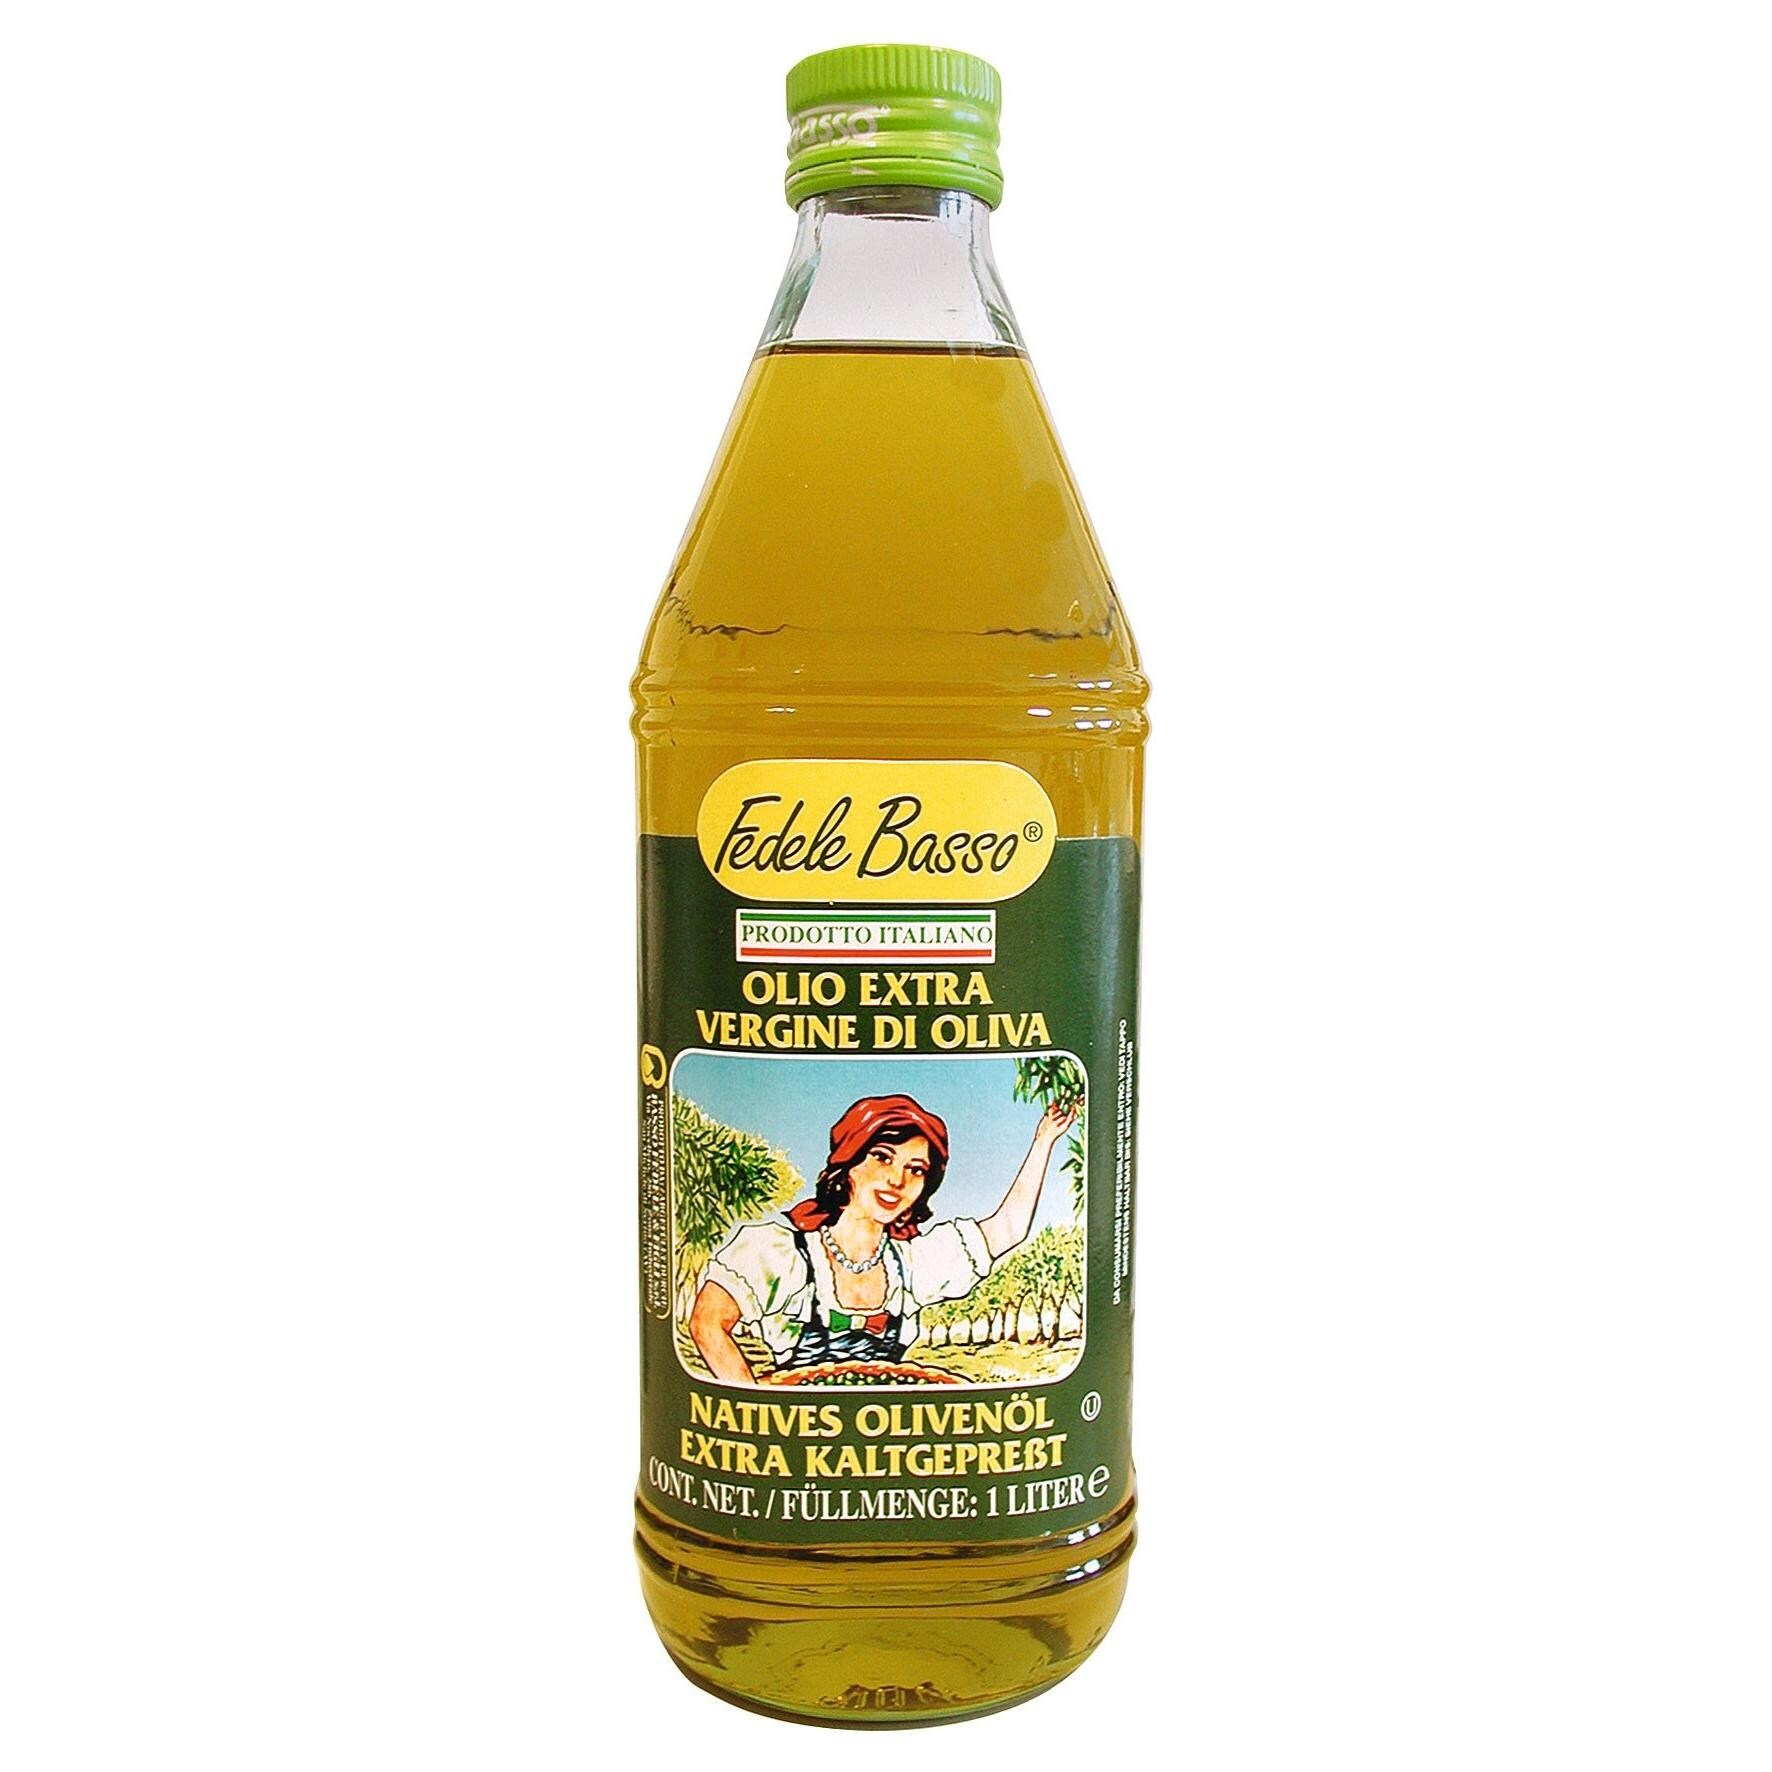 Basso - Natives Olivenöl Extra kaltgepresstes Speiseöl - 1l